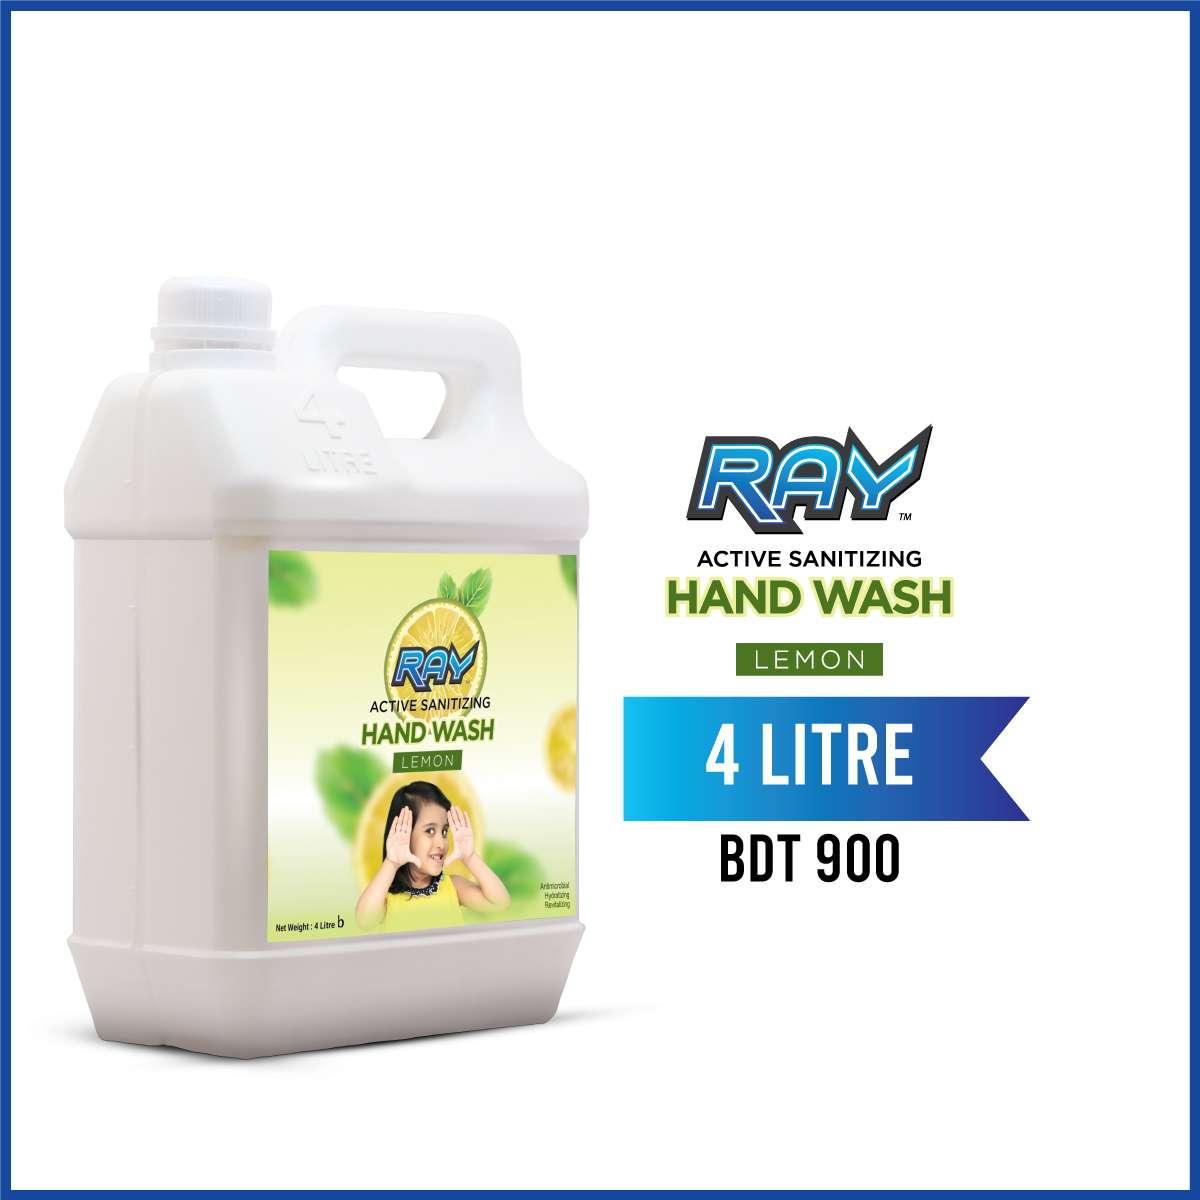 RAY Active Sanitizing Hand Wash Refill 4 Liter Lemon